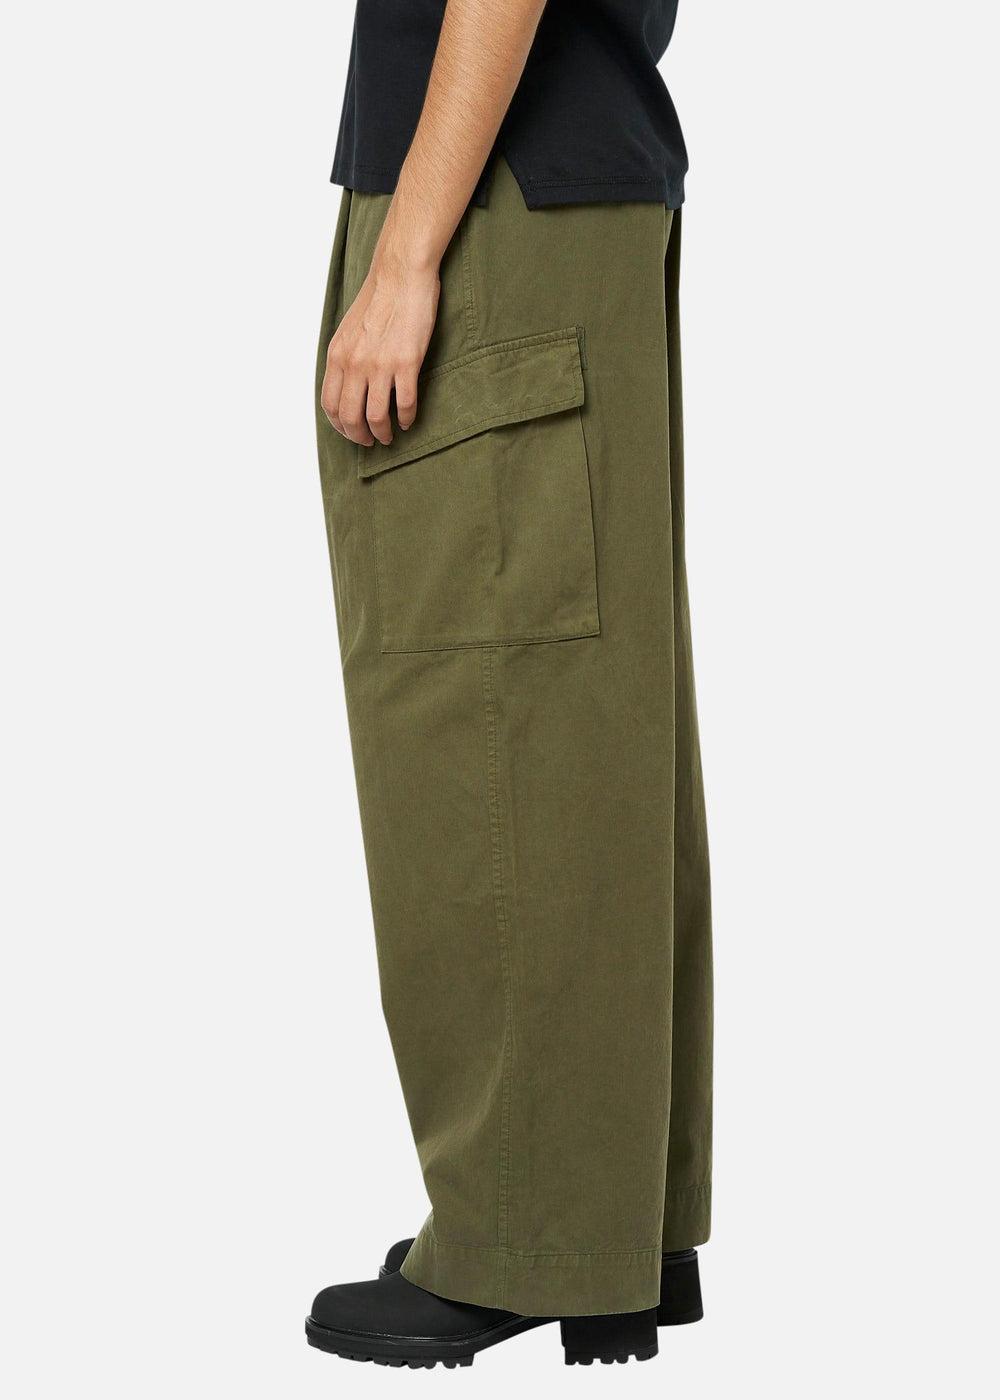 Raeburn Laundered Trouser (W) Olive